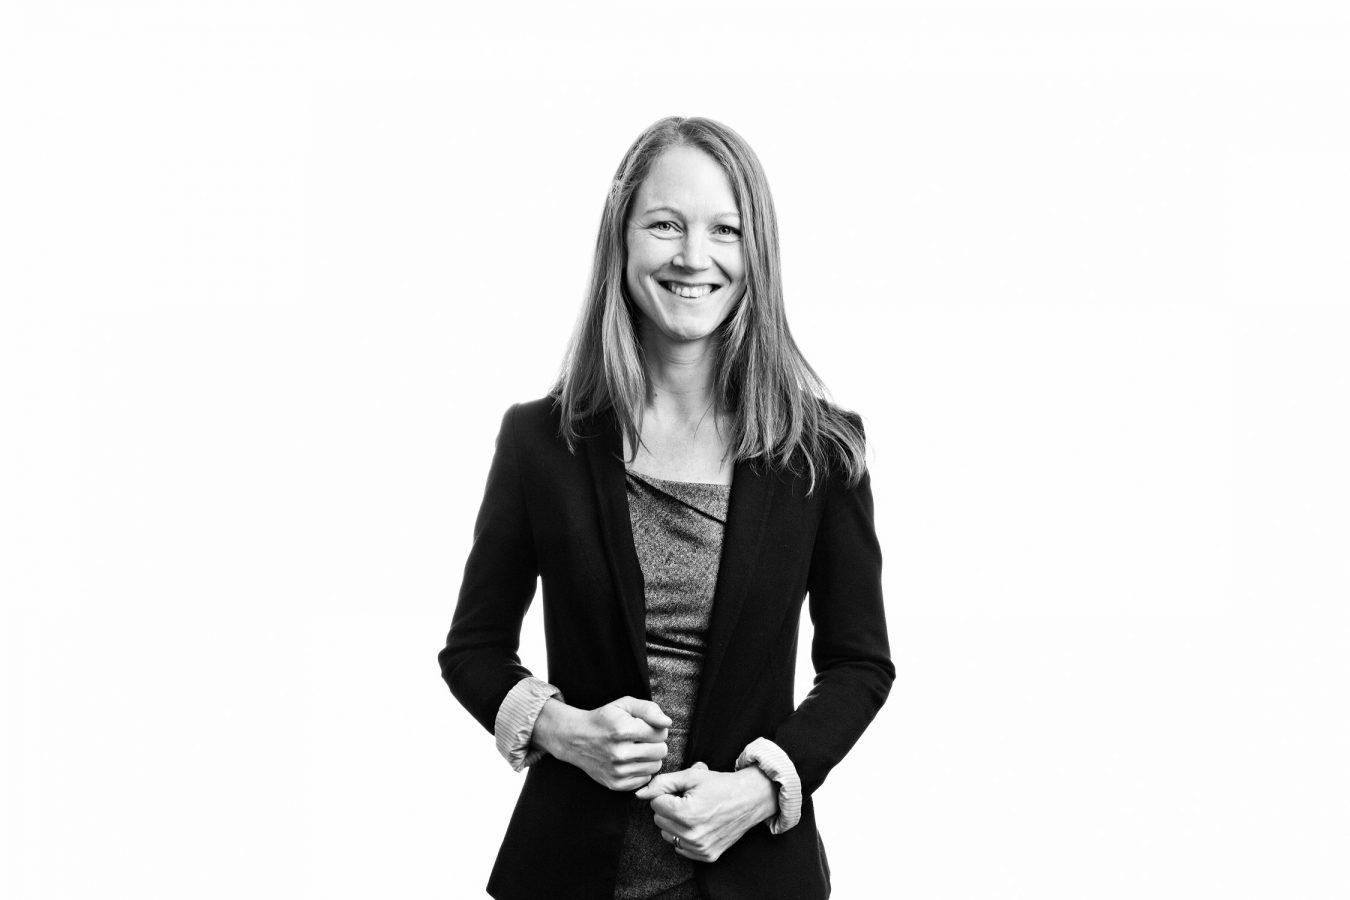 Taylor-Vinters-female-staff-portrait-studio-black-and-white-london